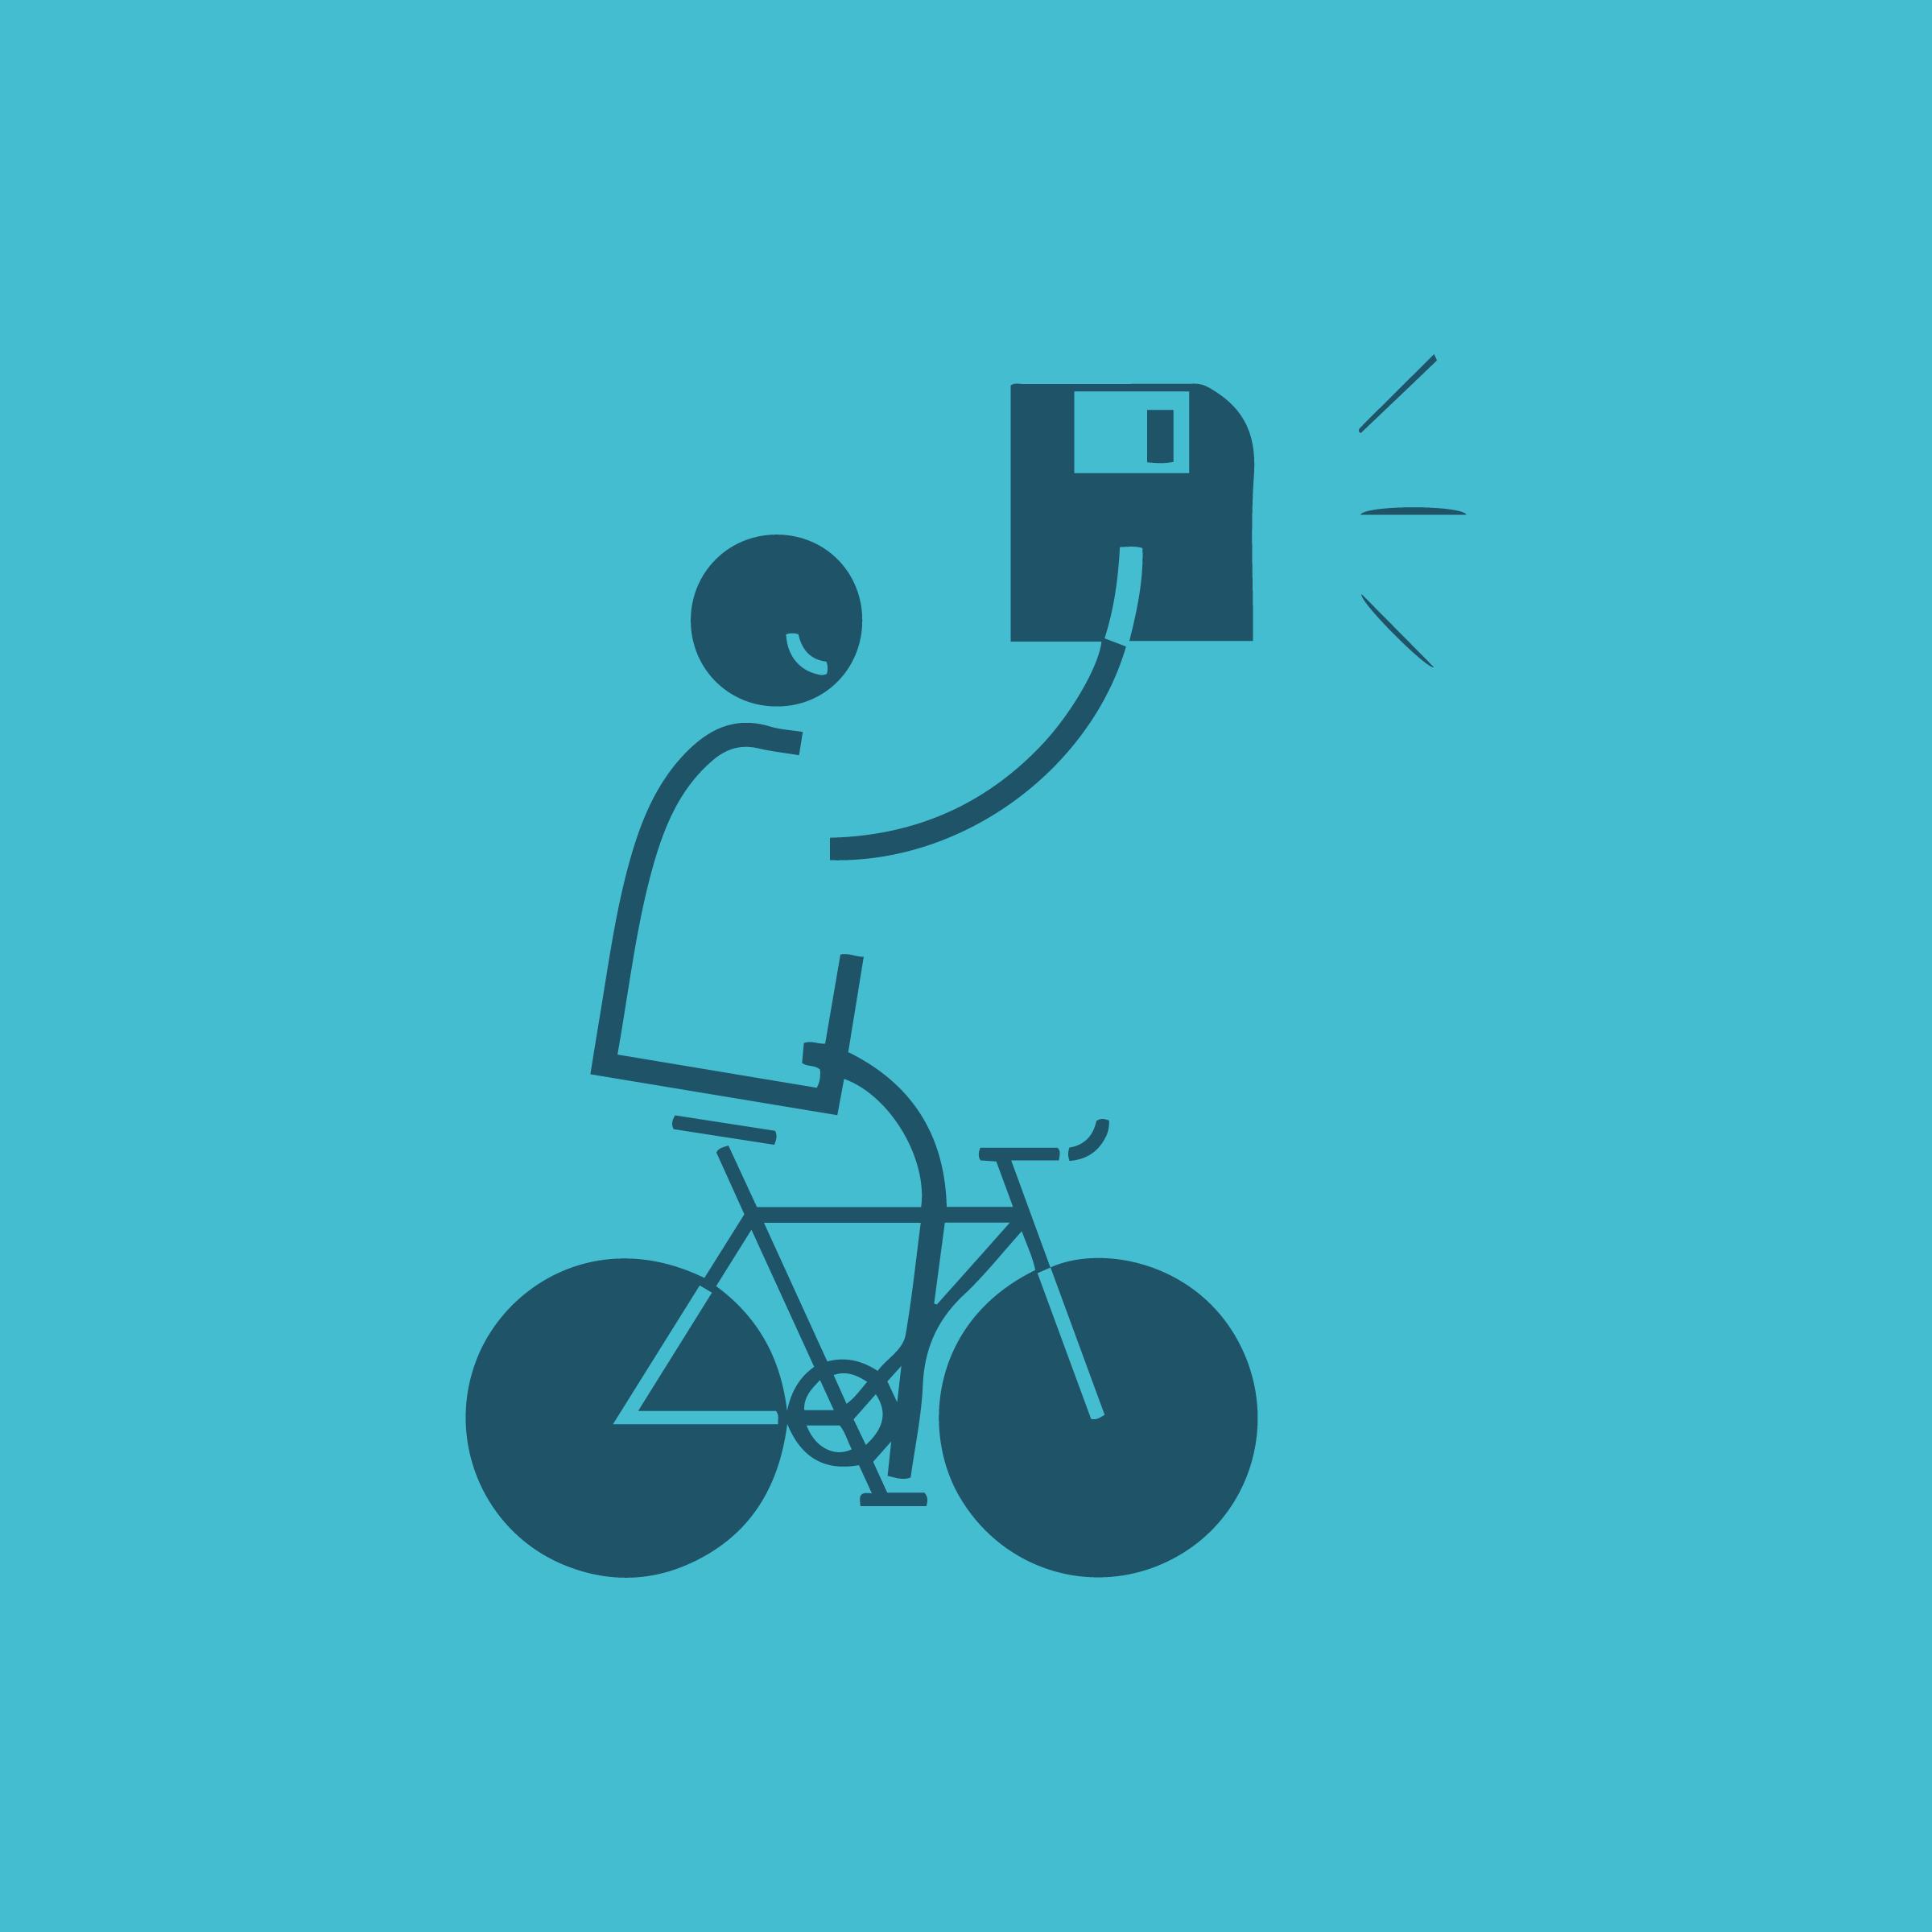 Image of a stick figure riding a bike